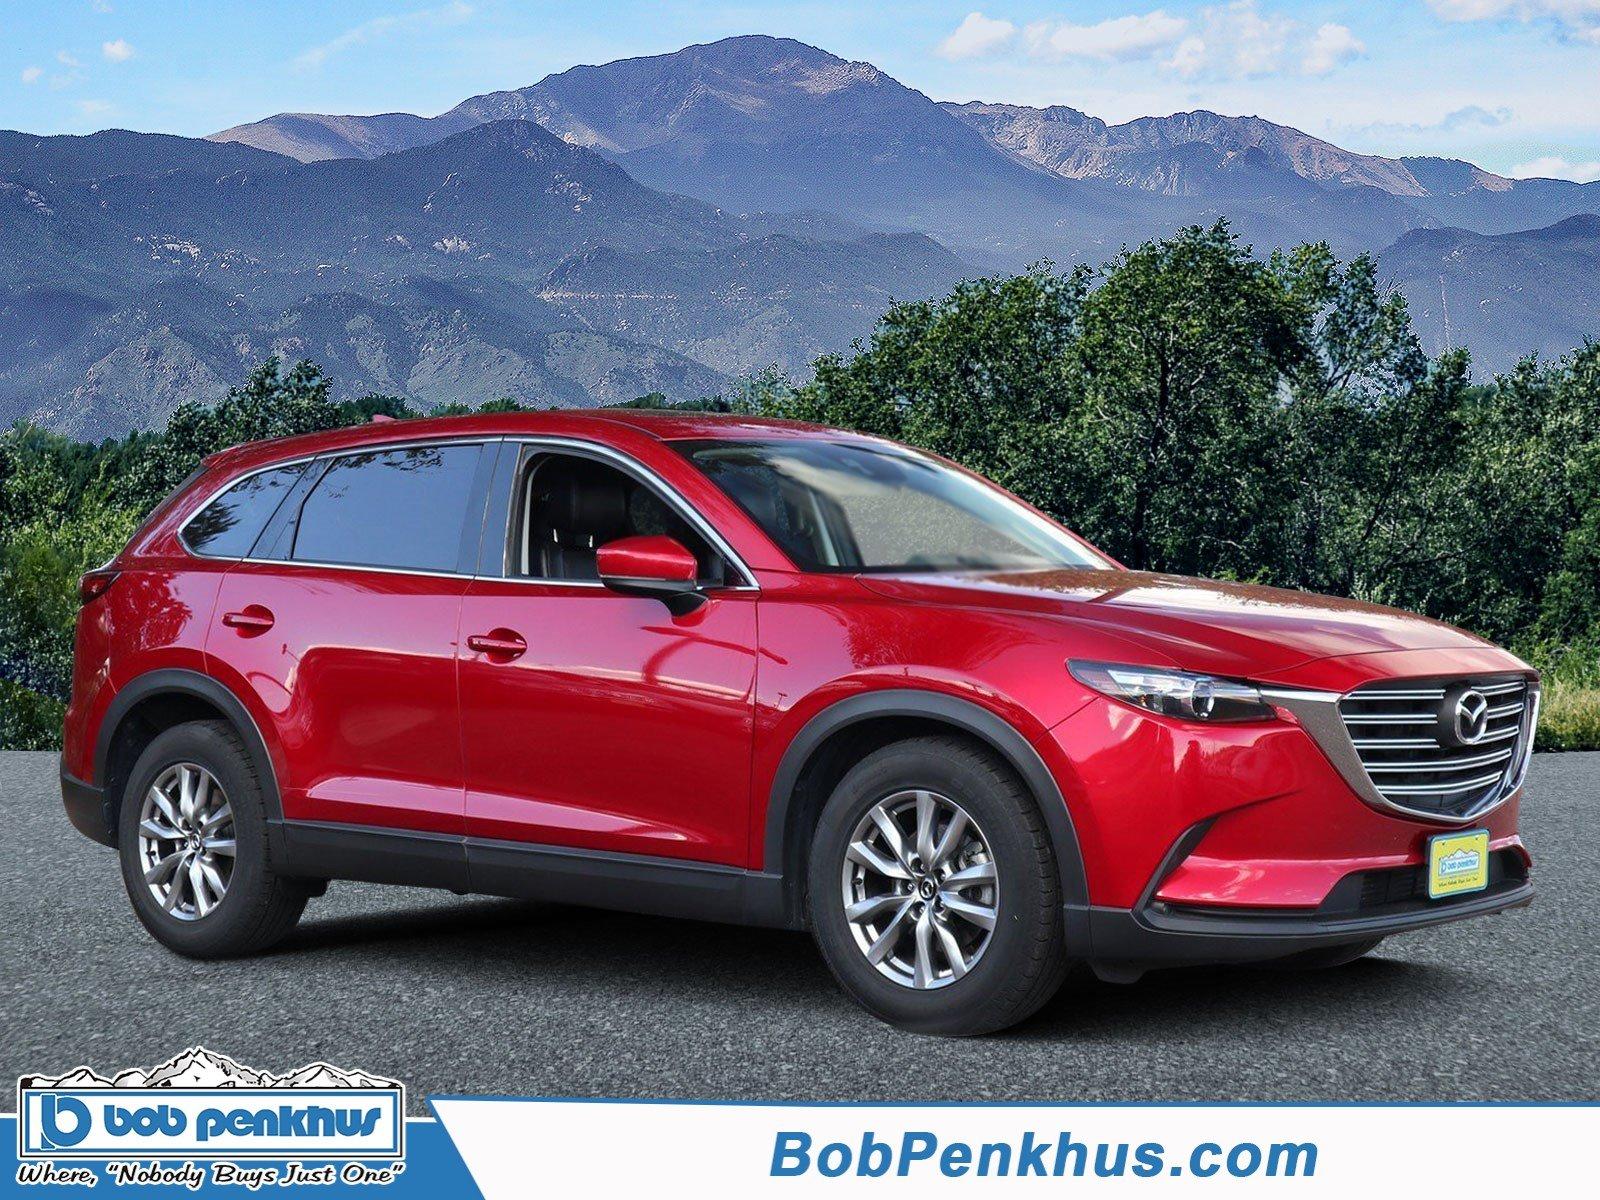 2016 Mazda Mazda CX-9 Touring SUV